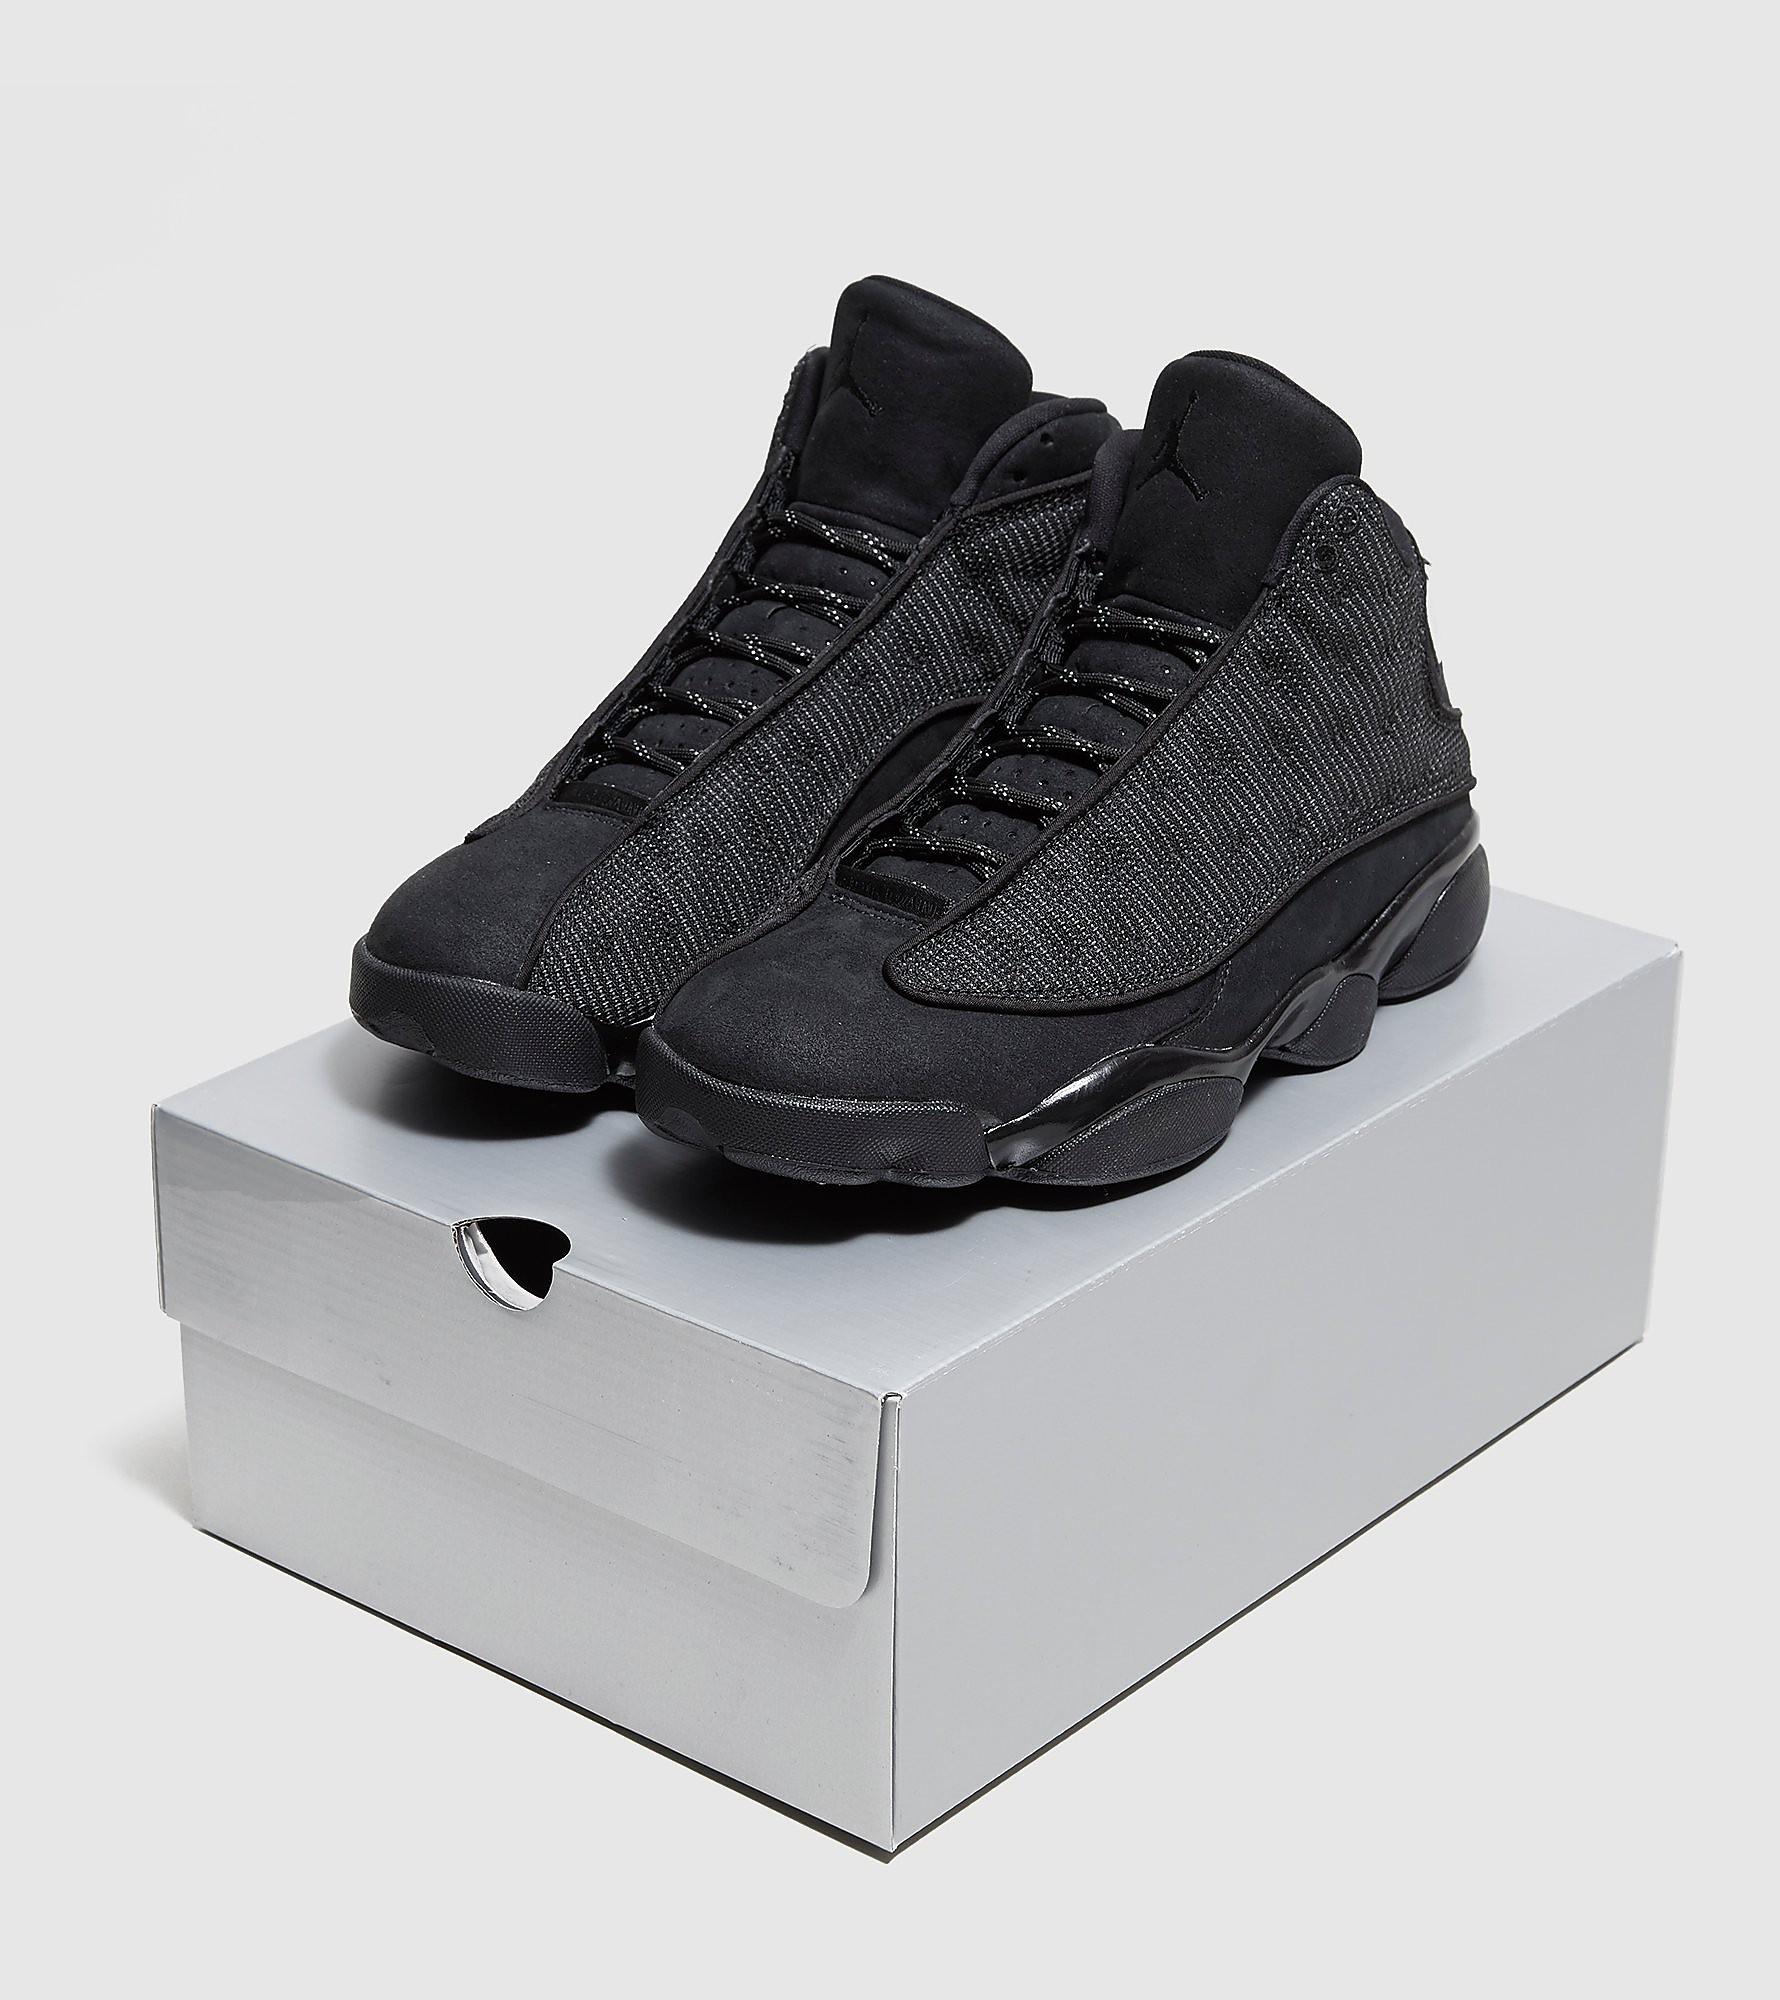 Jordan Retro 13 'Black Cat'